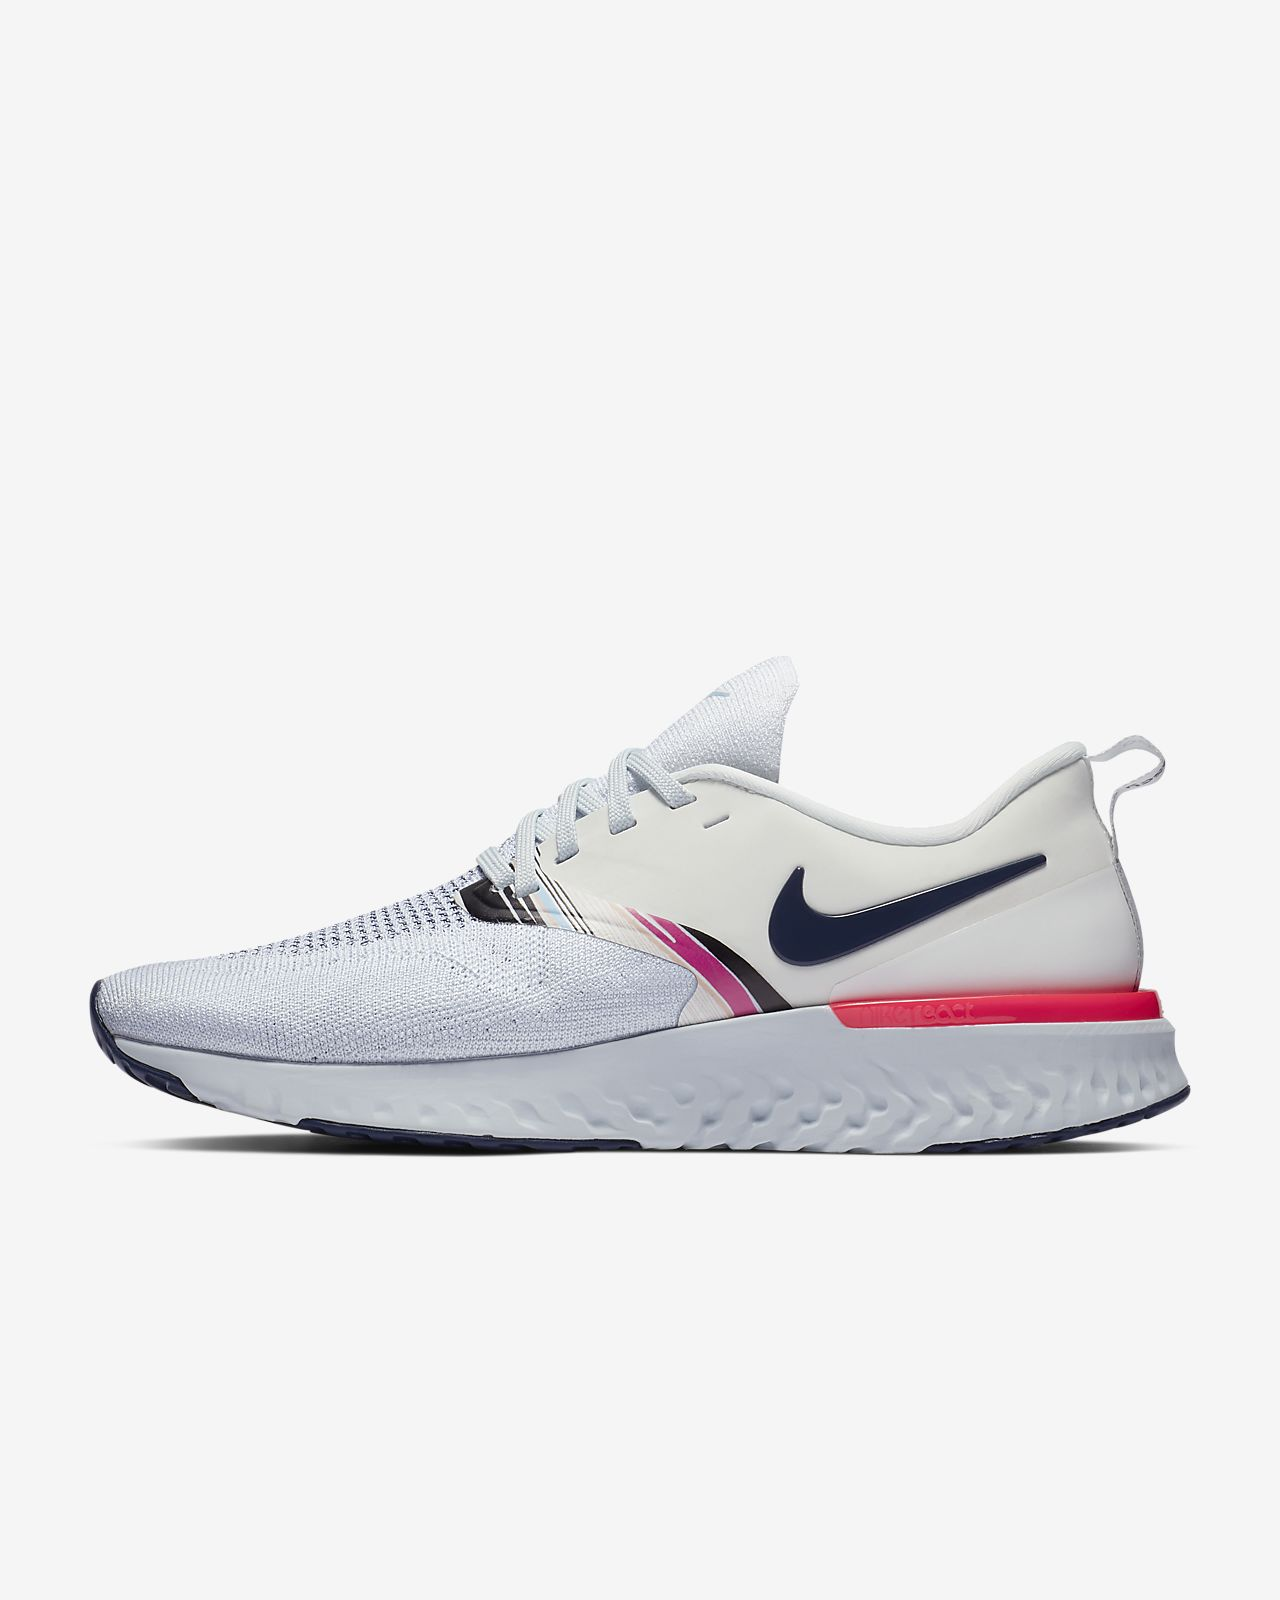 Nike Odyssey React Flyknit 2 Premium Sabatilles de running - Dona